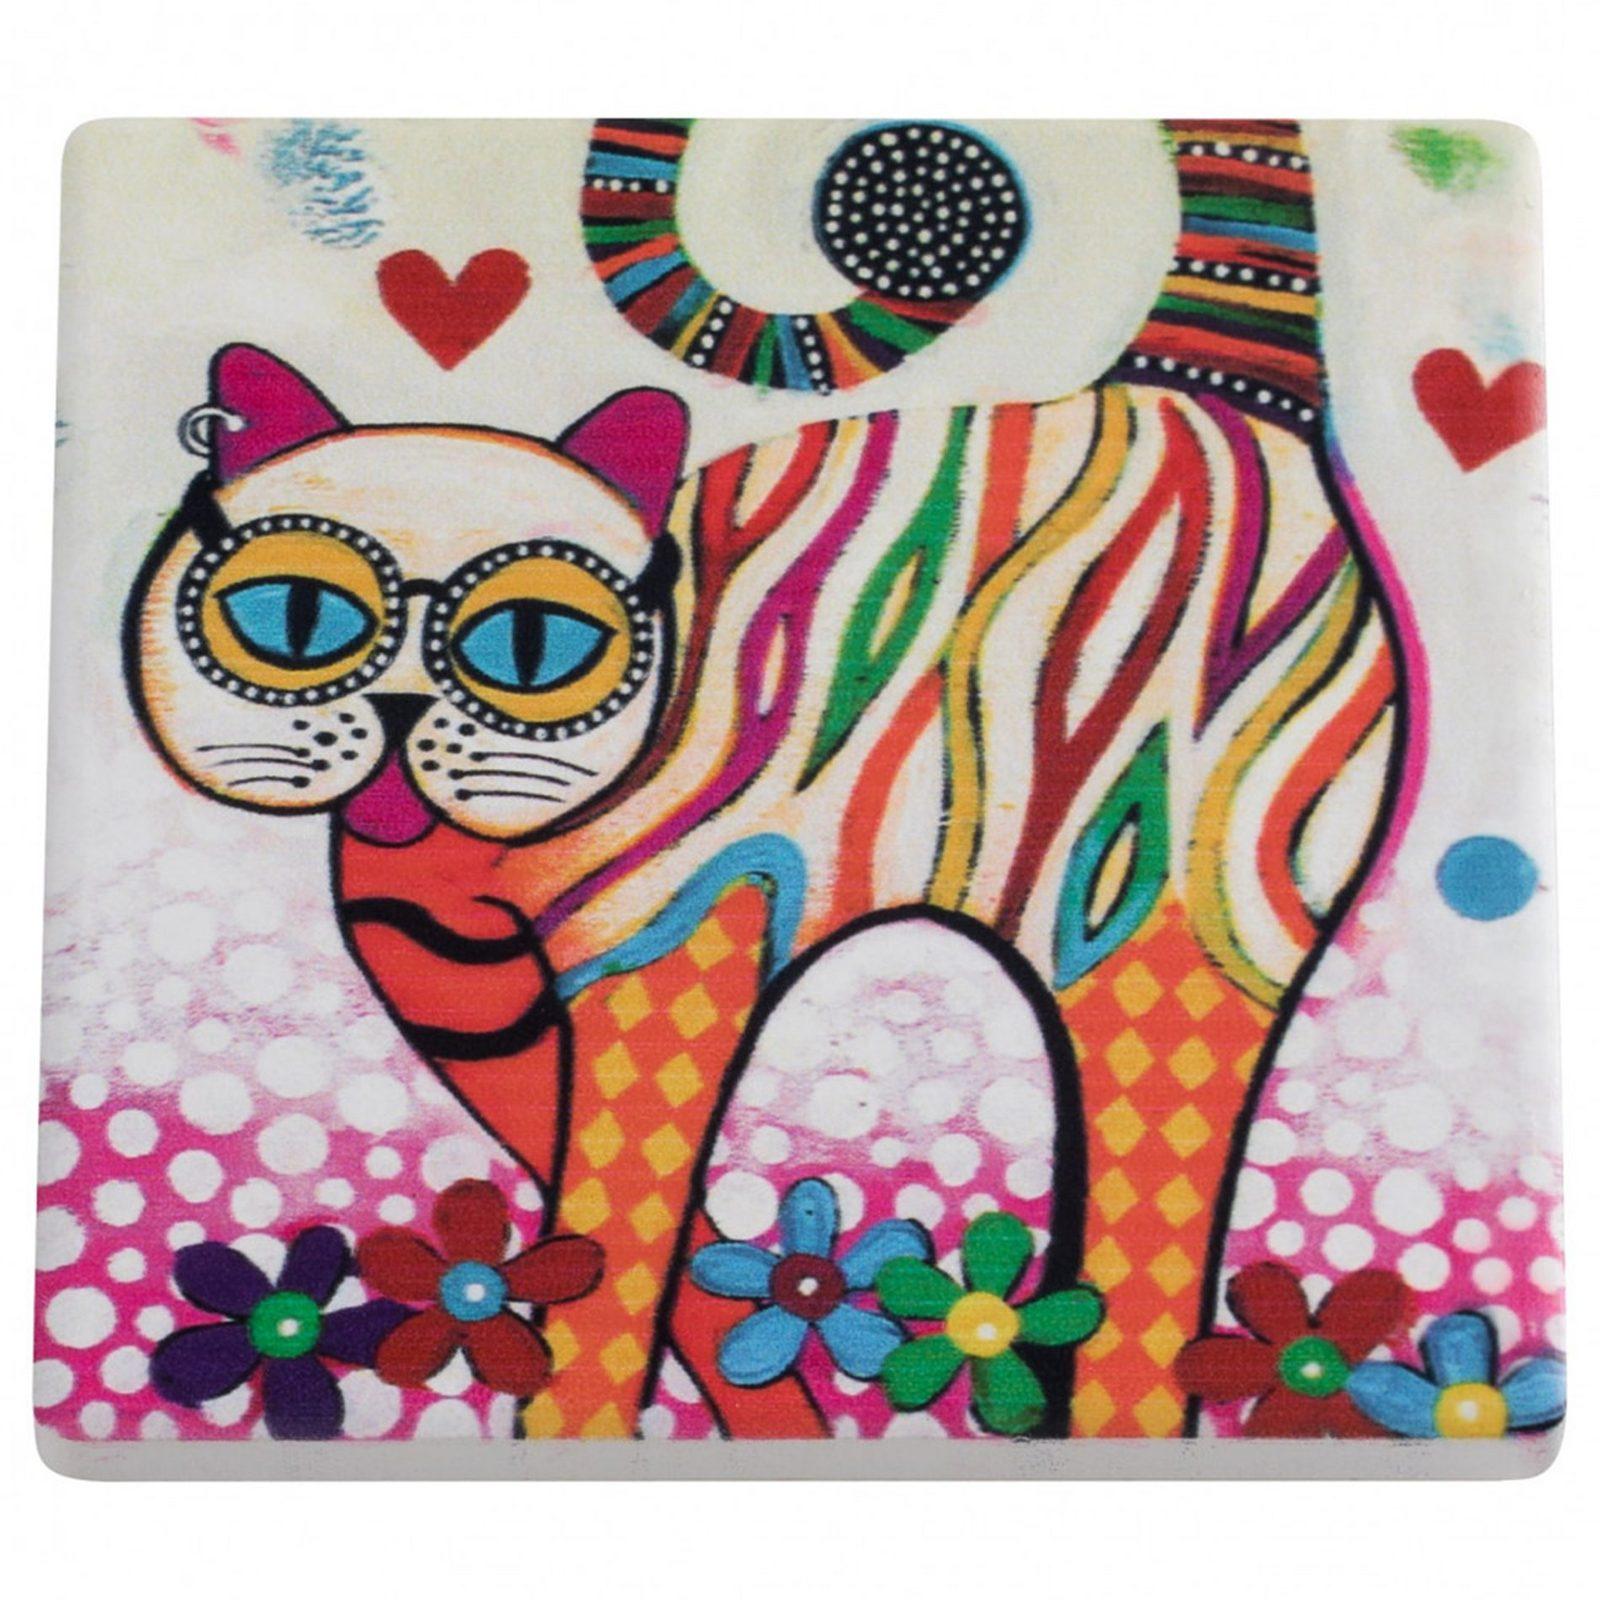 Maxwell & Williams Tabby Smily Style Keramikuntersetzer jetztbilligerkaufen